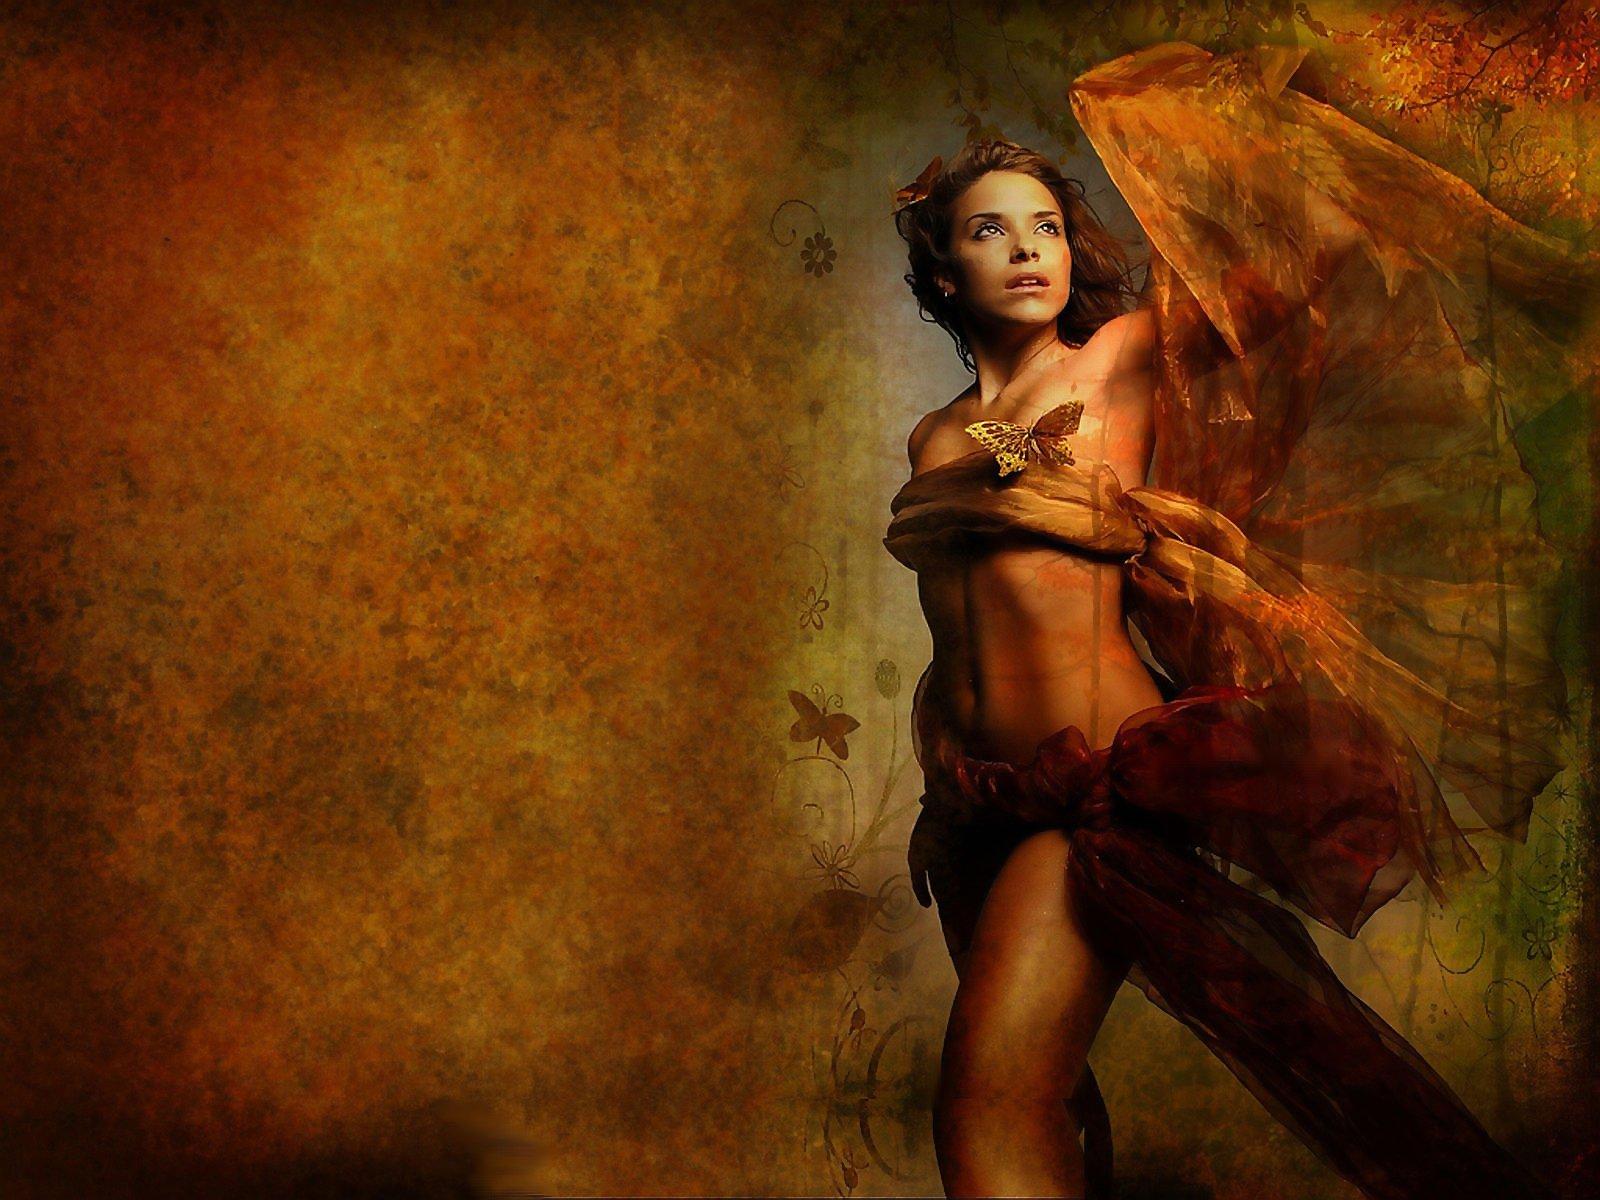 Artistique - Femmes  Fond d'écran